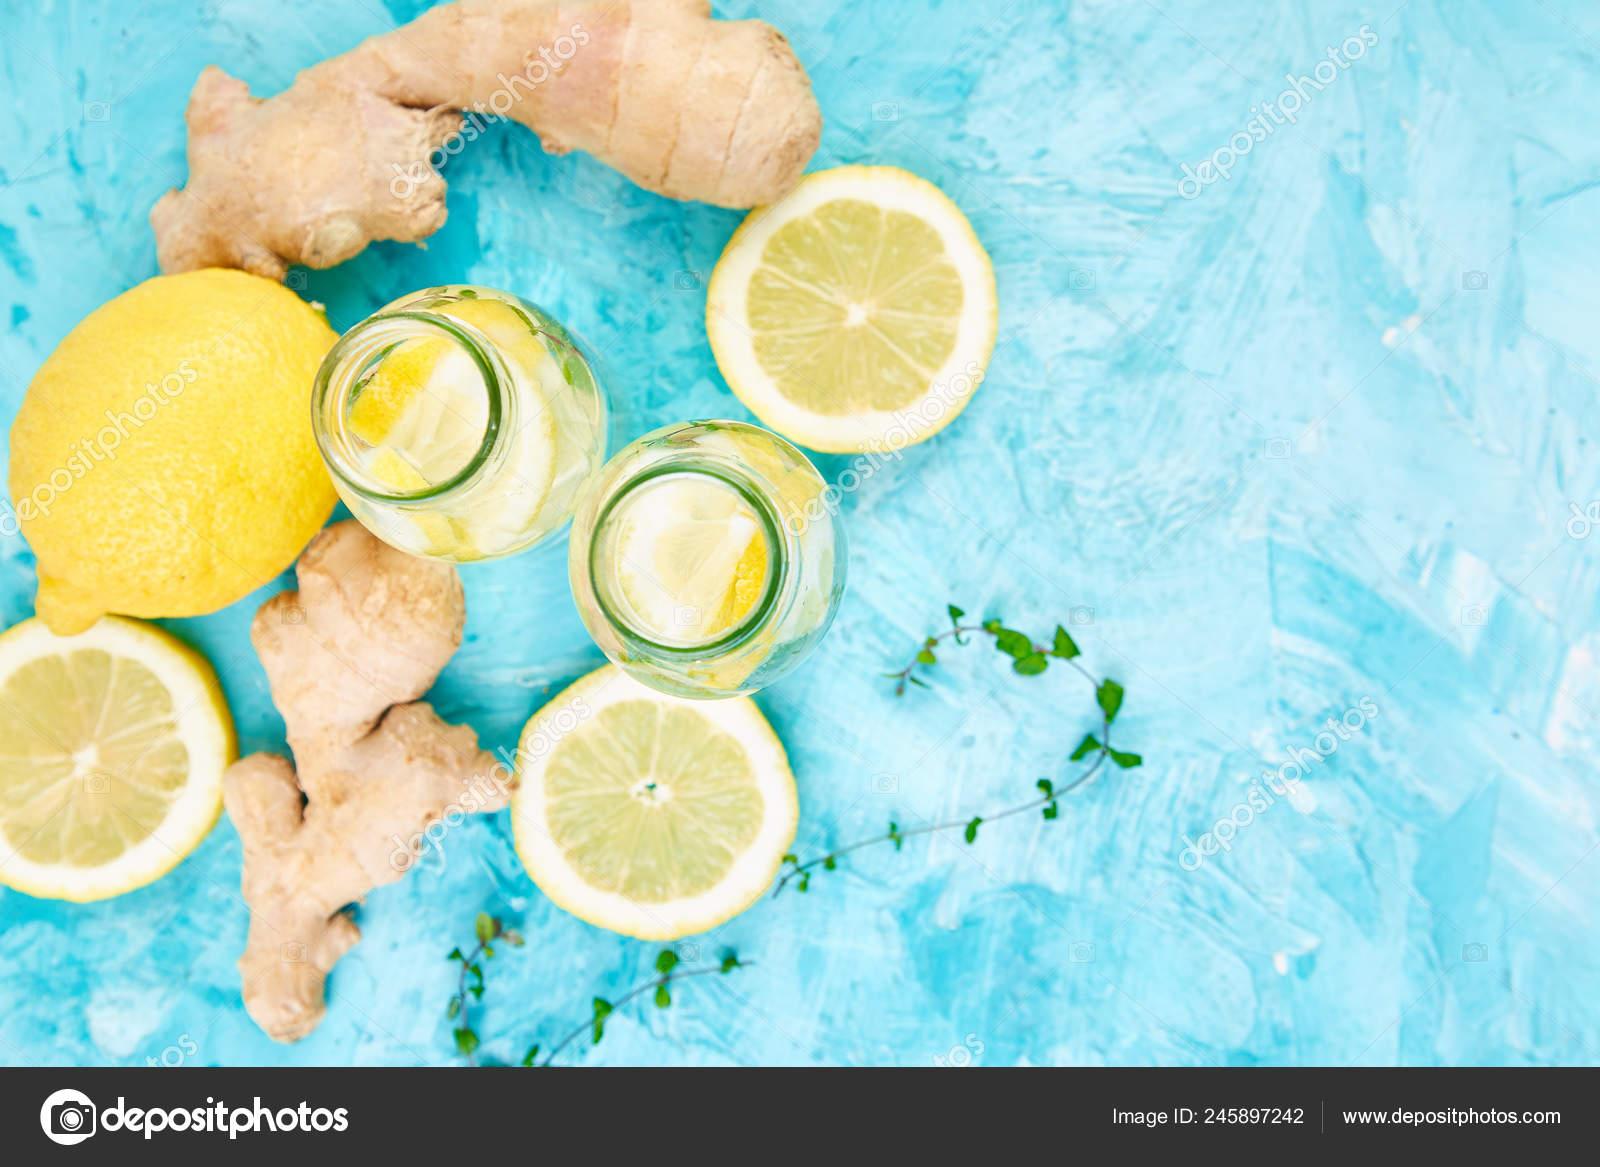 Trendy Detox Healthy Drink Detox Water Bottles Ingredients Ginger